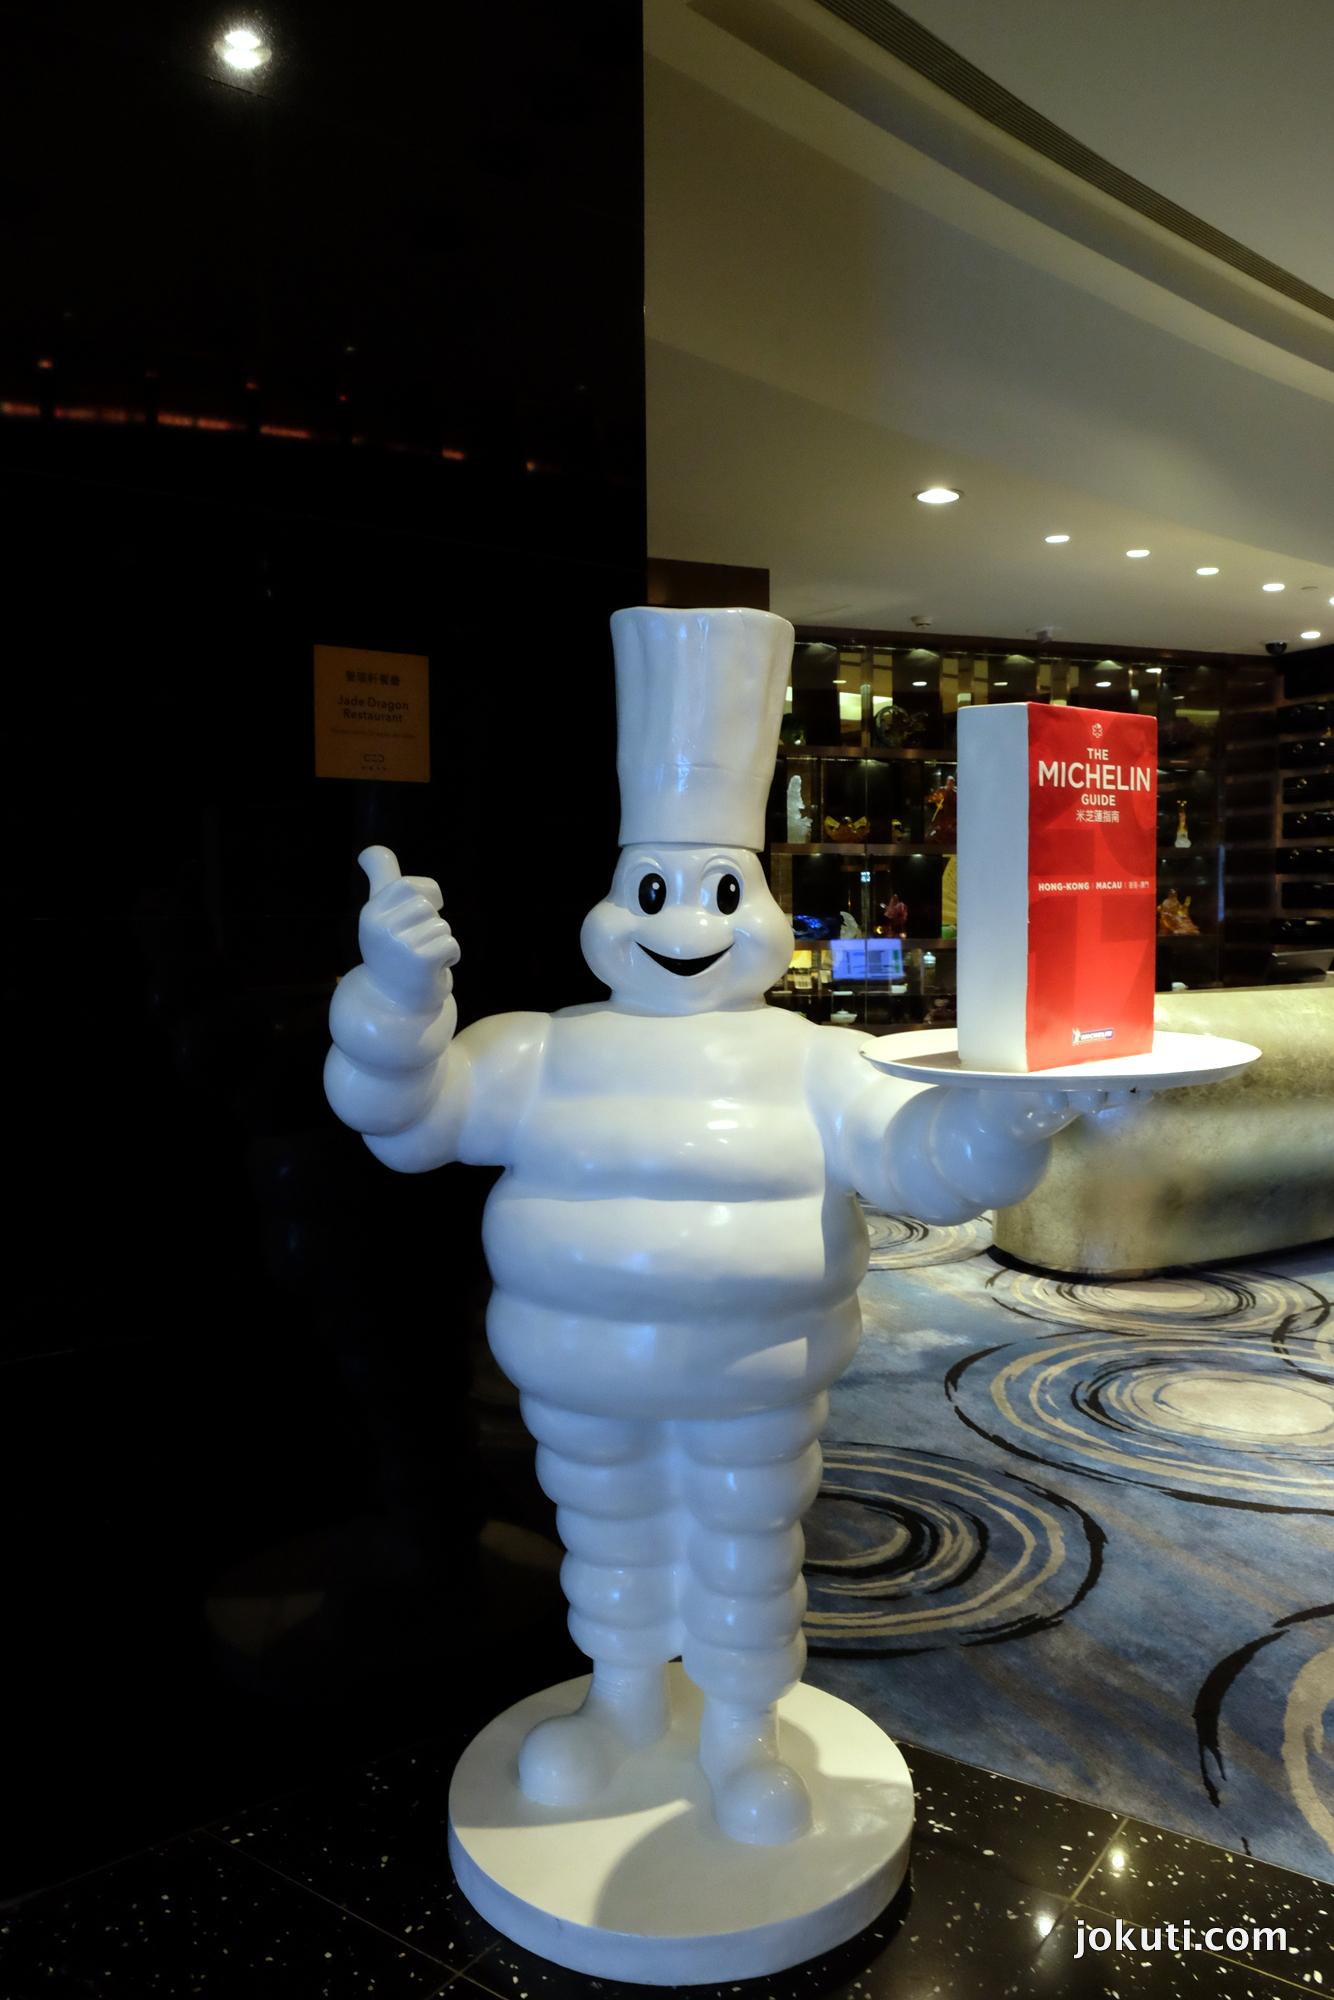 dscf6797_macau_makao_china_kinai_vilagevo_jokuti_jade_dragon_restaurant_cantonese_chinese_michelin_macau_makao_china_kinai_vilagevo_jokuti.jpg